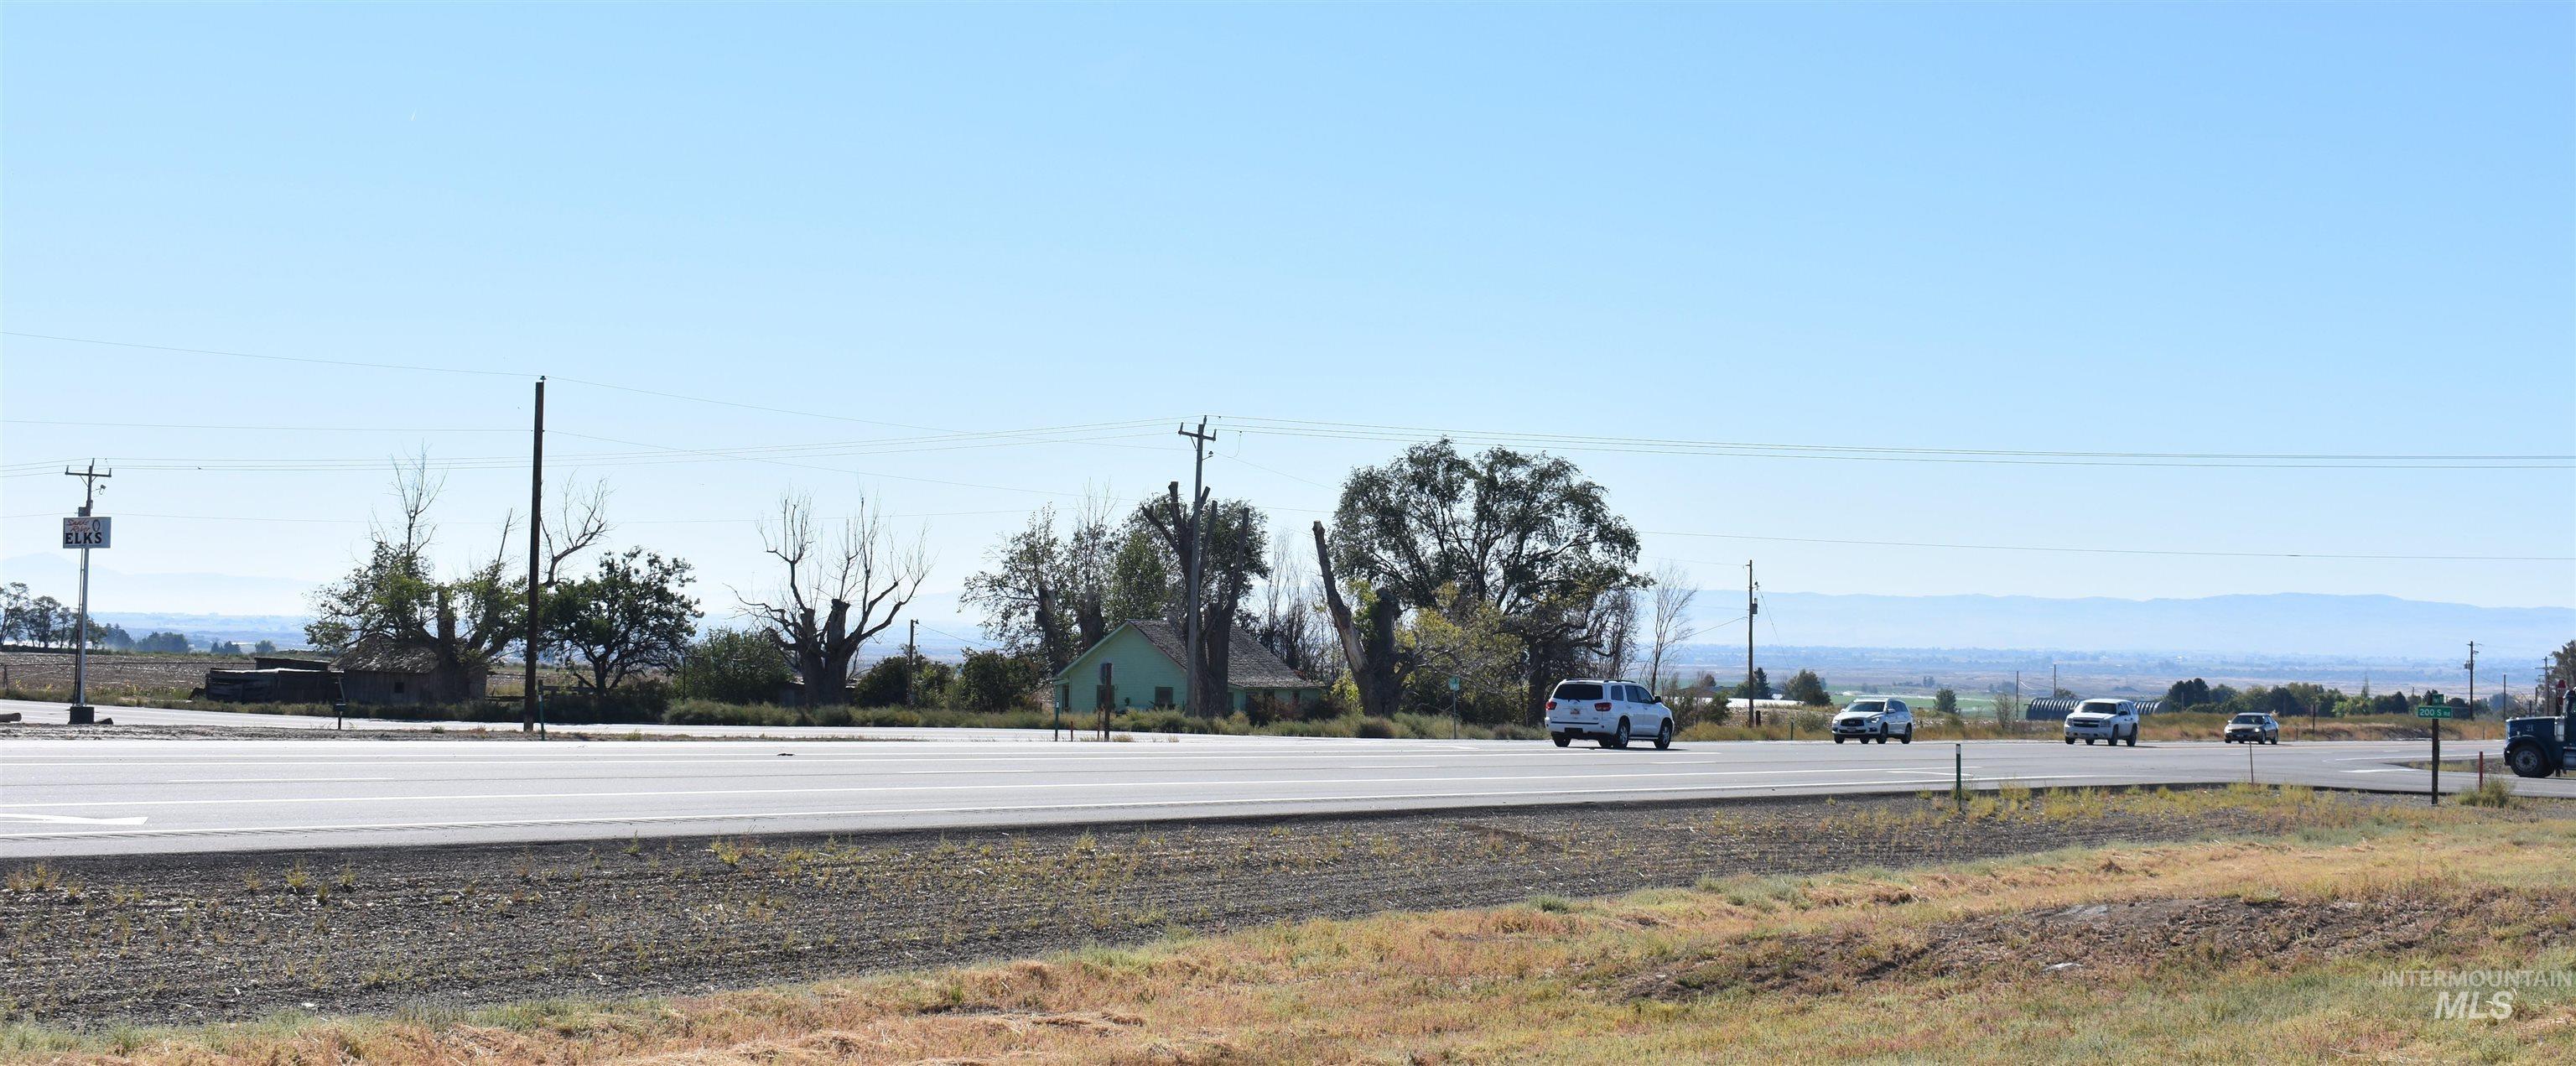 Highway 93 200 S Property Photo 2